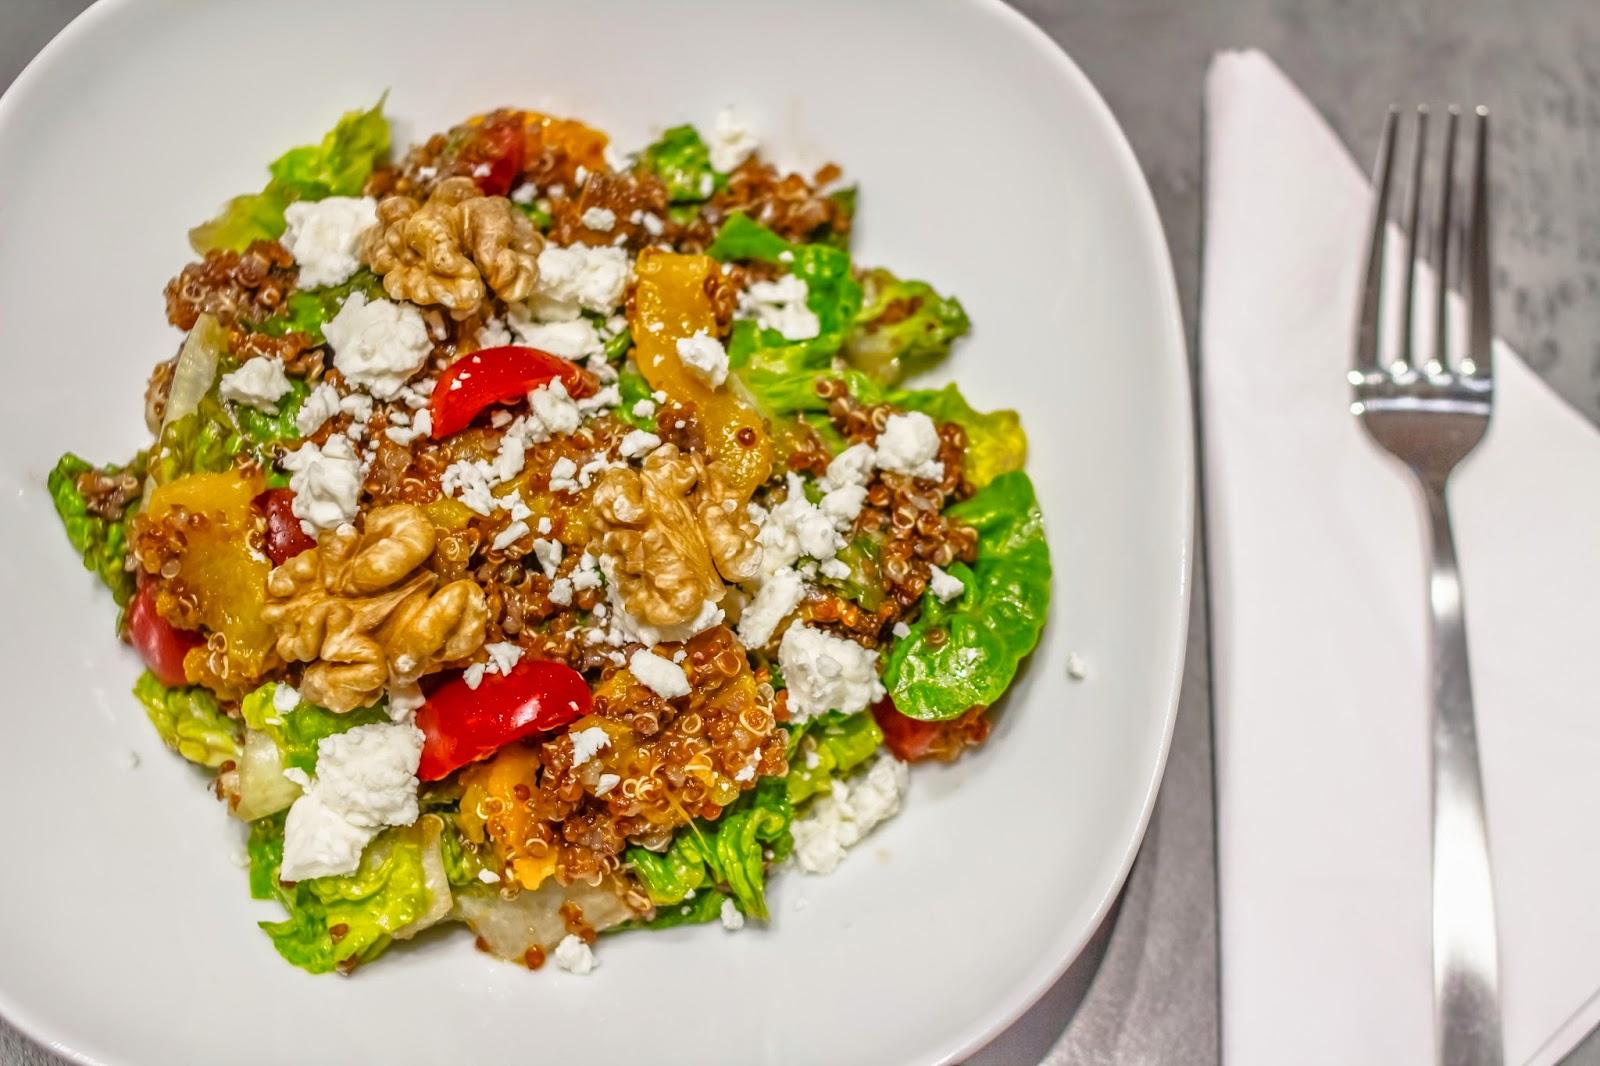 Roter Quinoa Salat mit Schafskäse